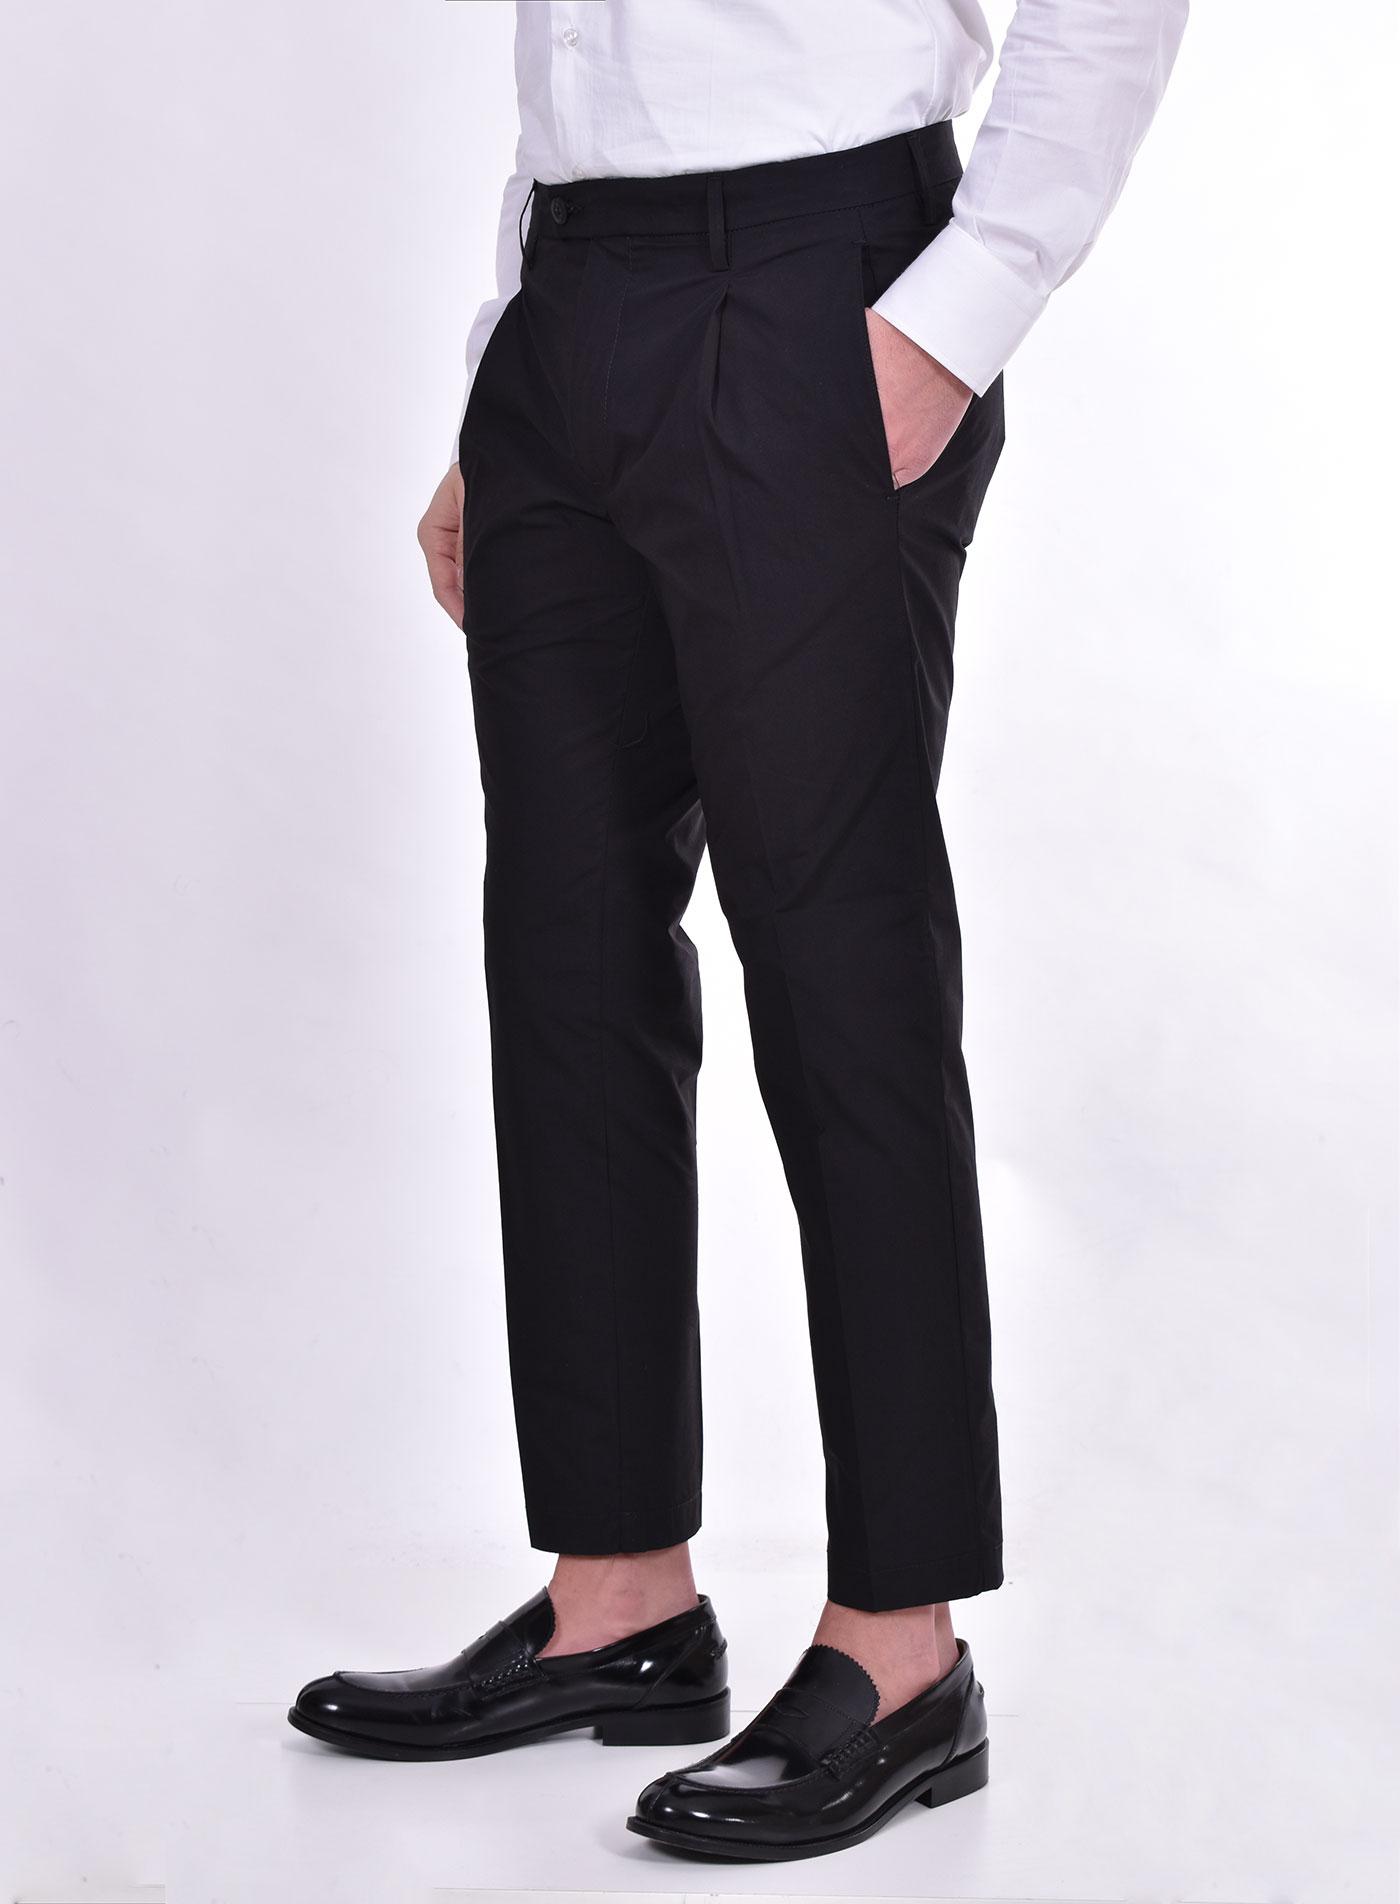 Bro Ship chicago black trousers BRO SHIP | BSCHI7025019